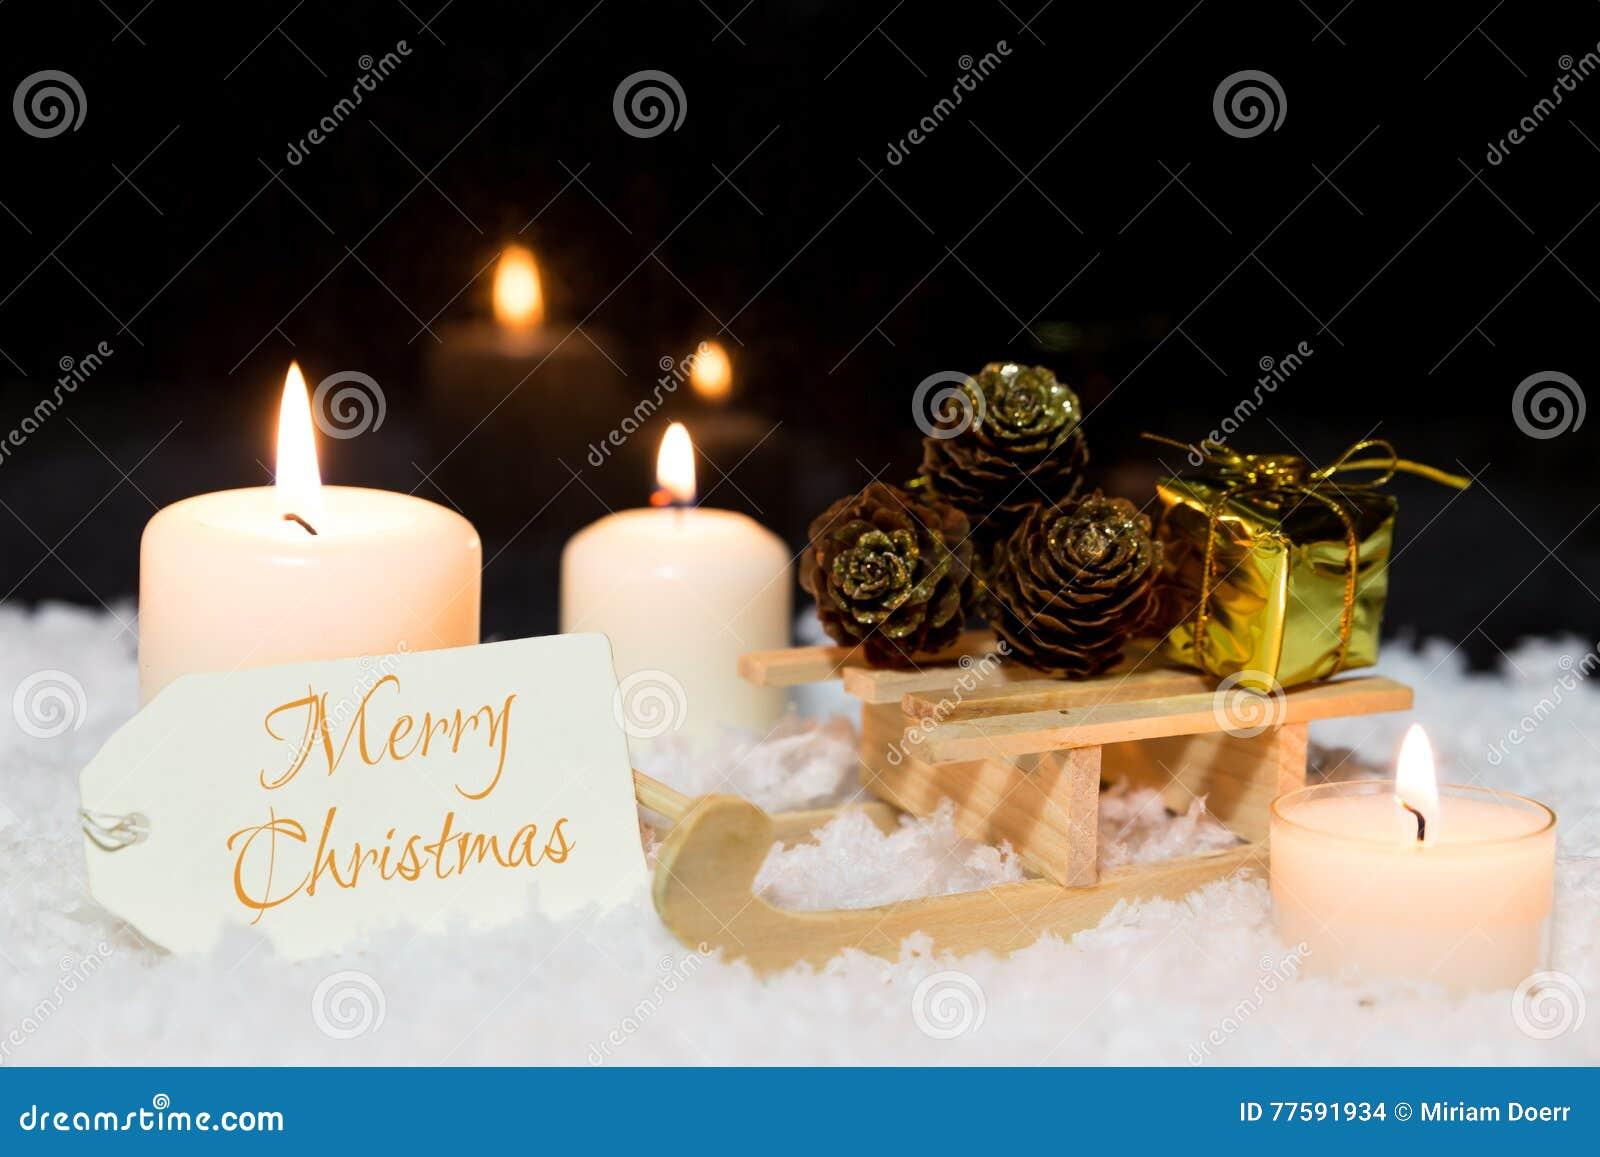 German Christmas Ornament Candles